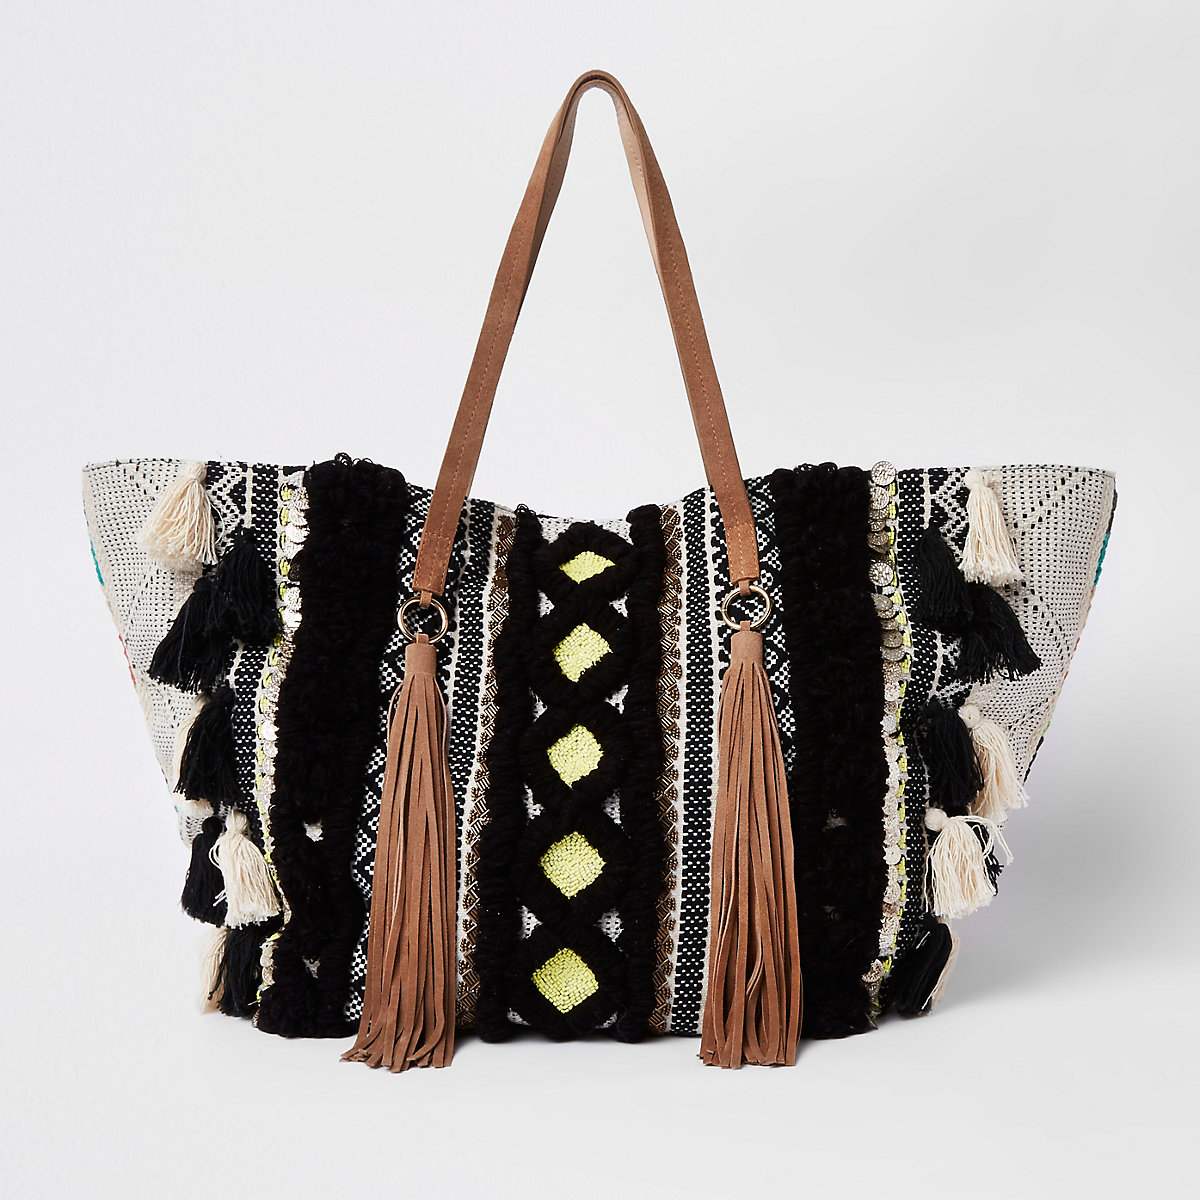 Black large tassel tote shopper bag